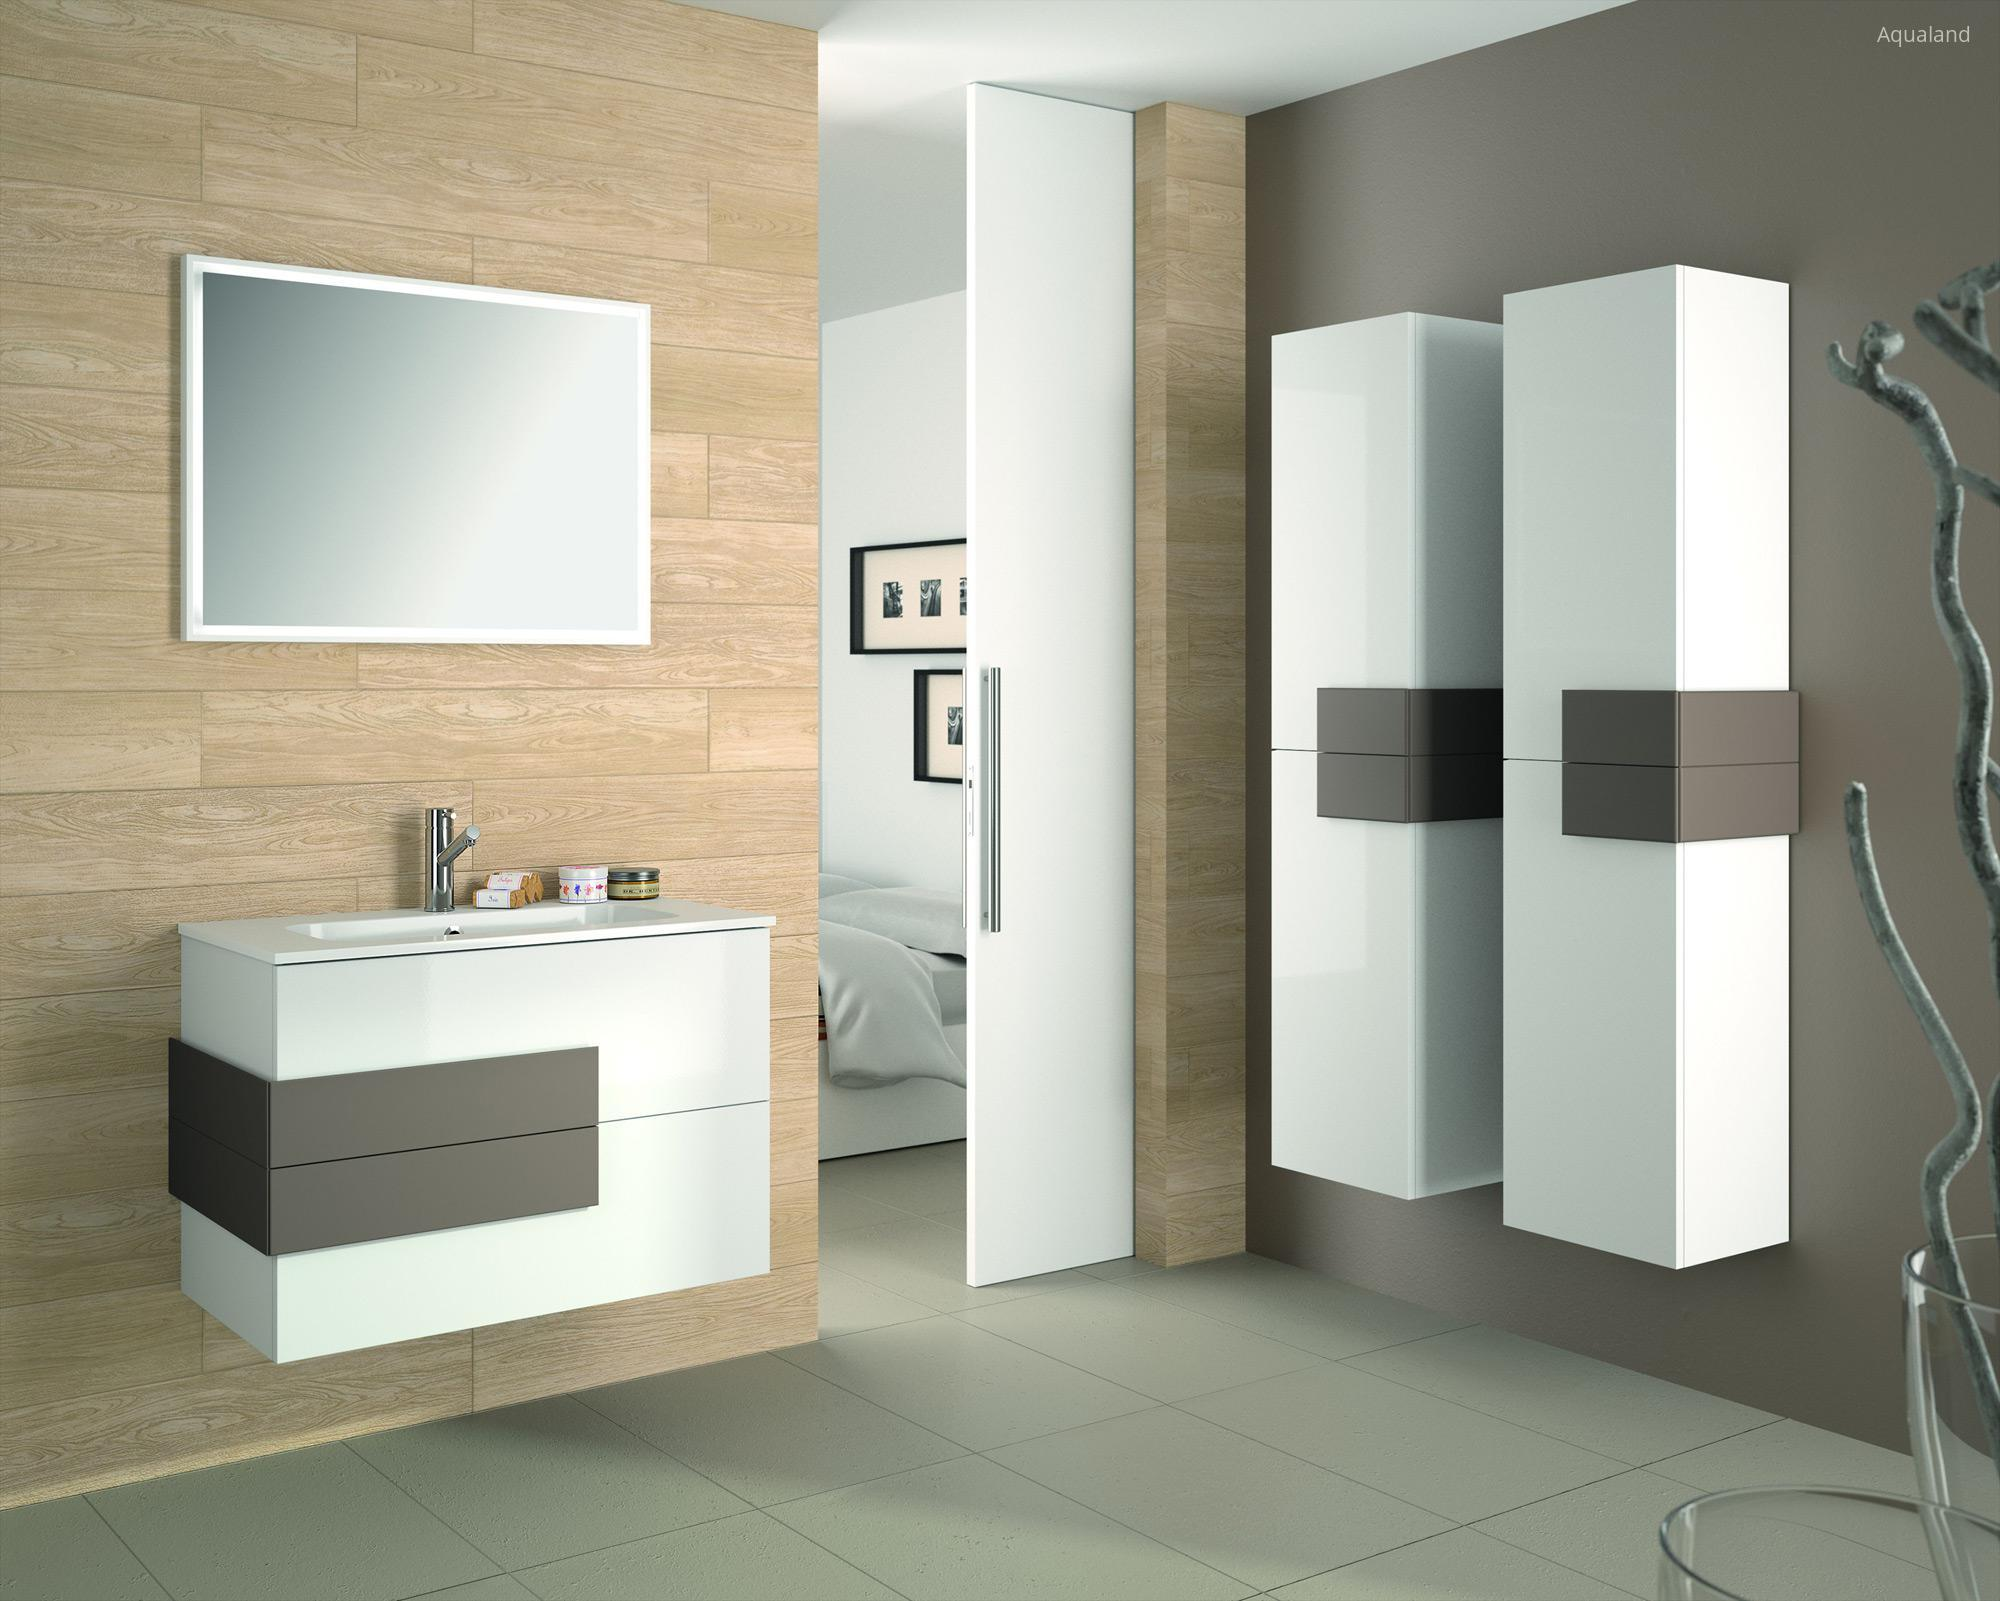 Salgar Cronos fürdőszoba bútor // HOMEINFO.hu - Inspirációtár